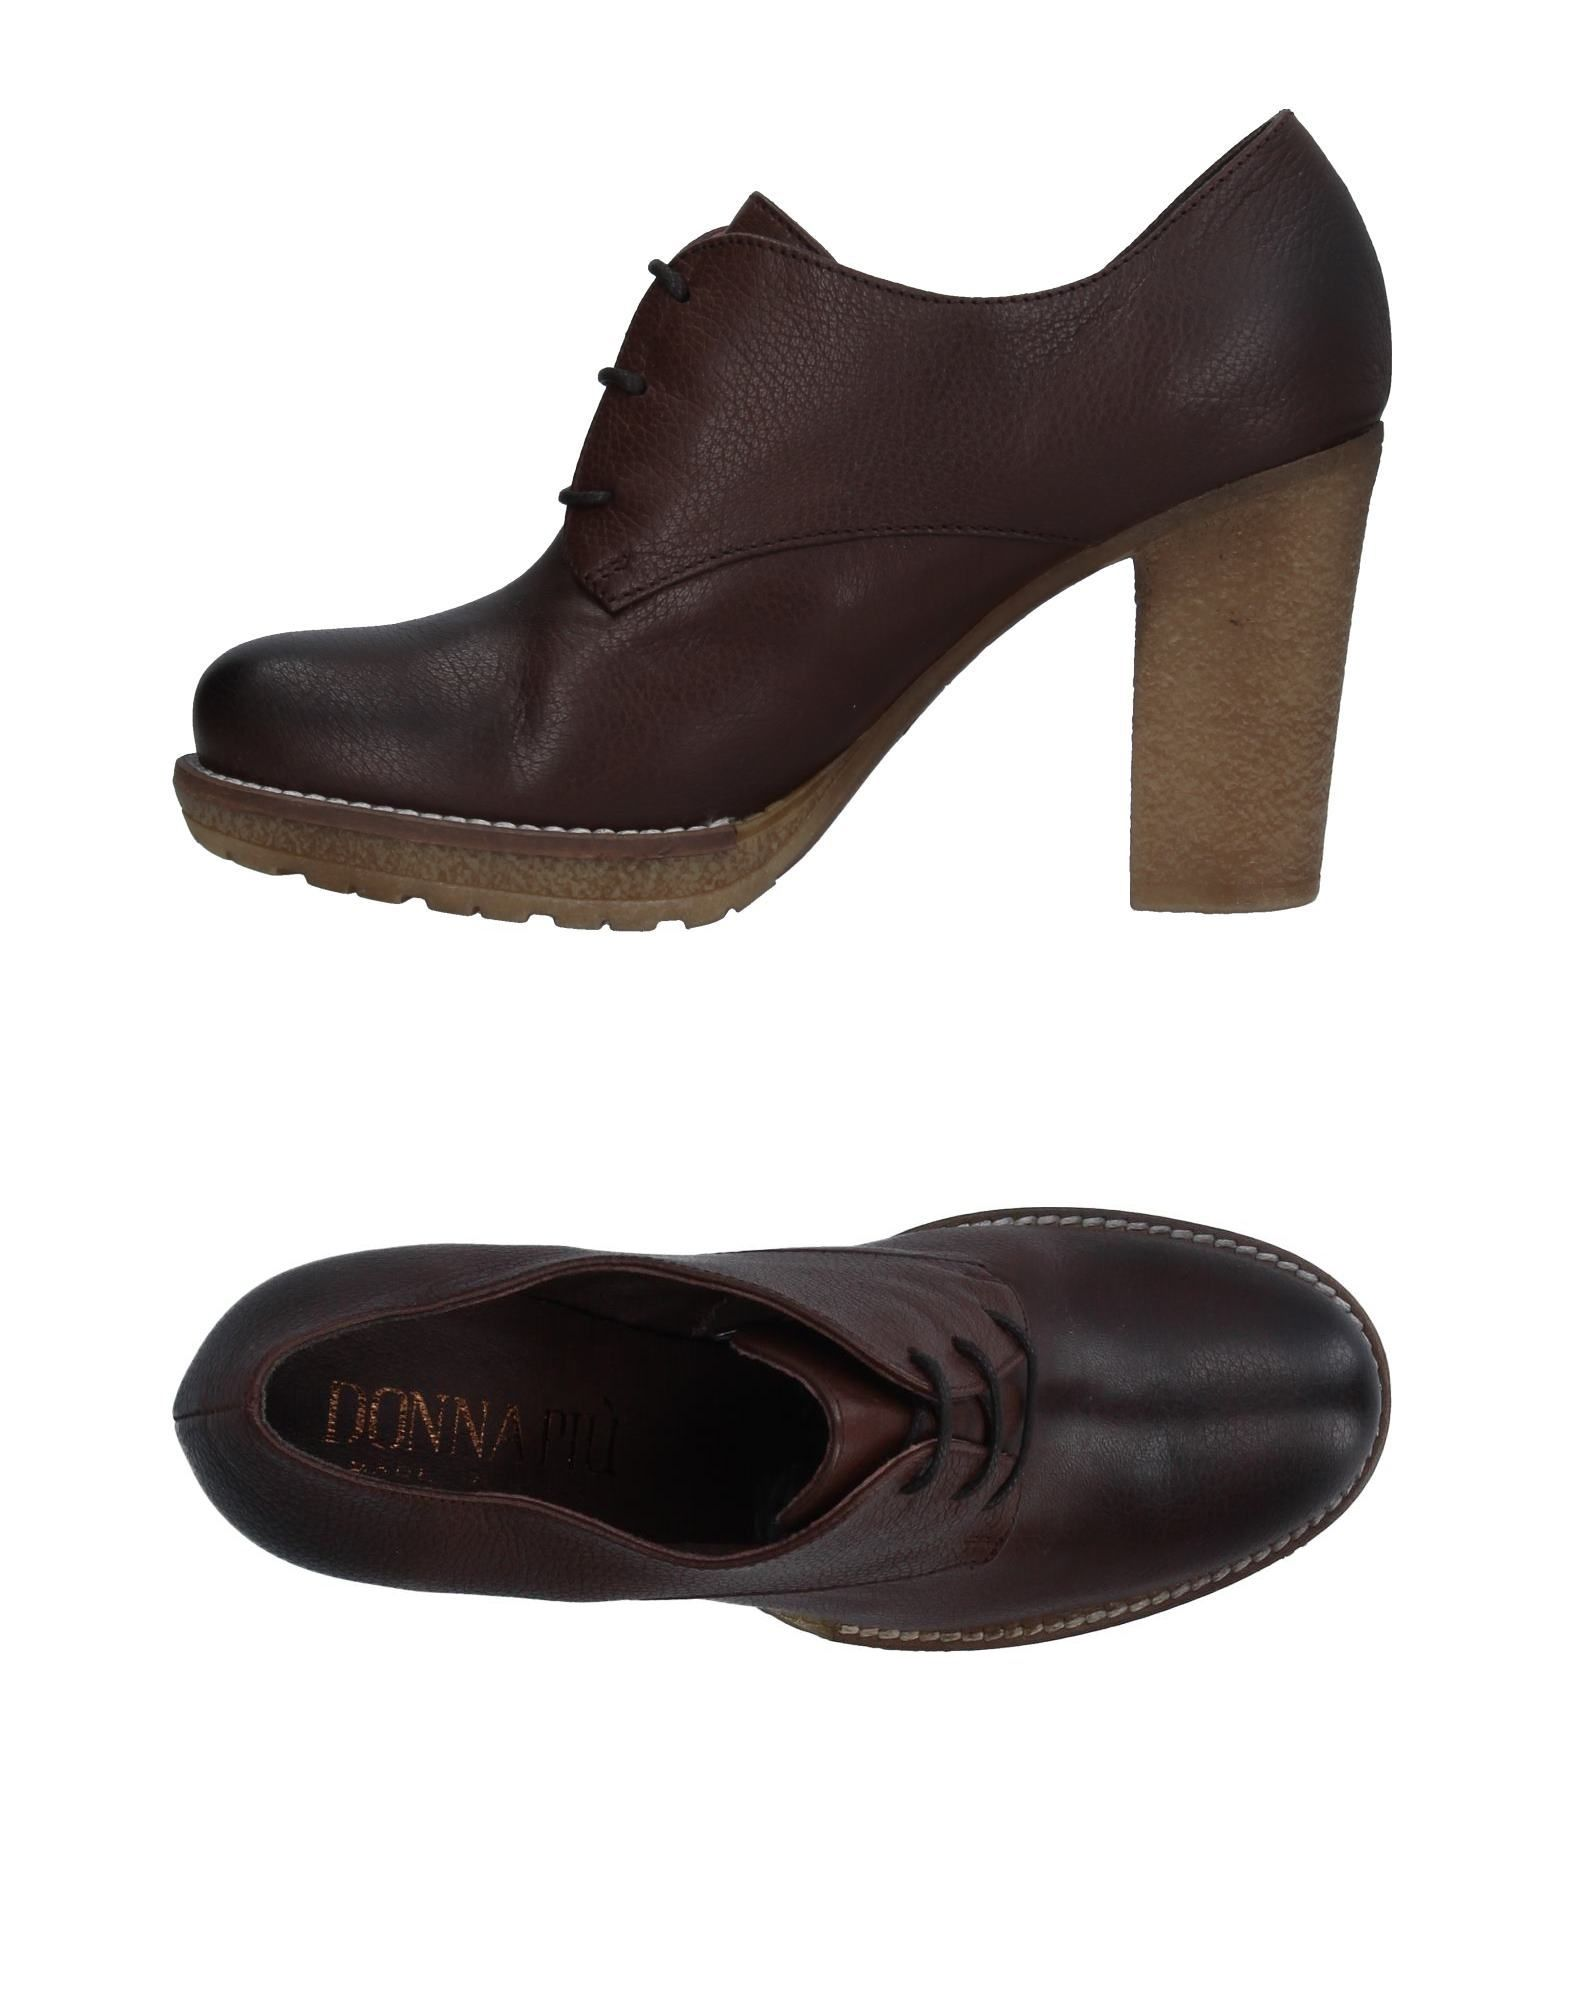 Donna Più Schnürschuhe Damen Schuhe  11280538ND Neue Schuhe Damen fbf8bb